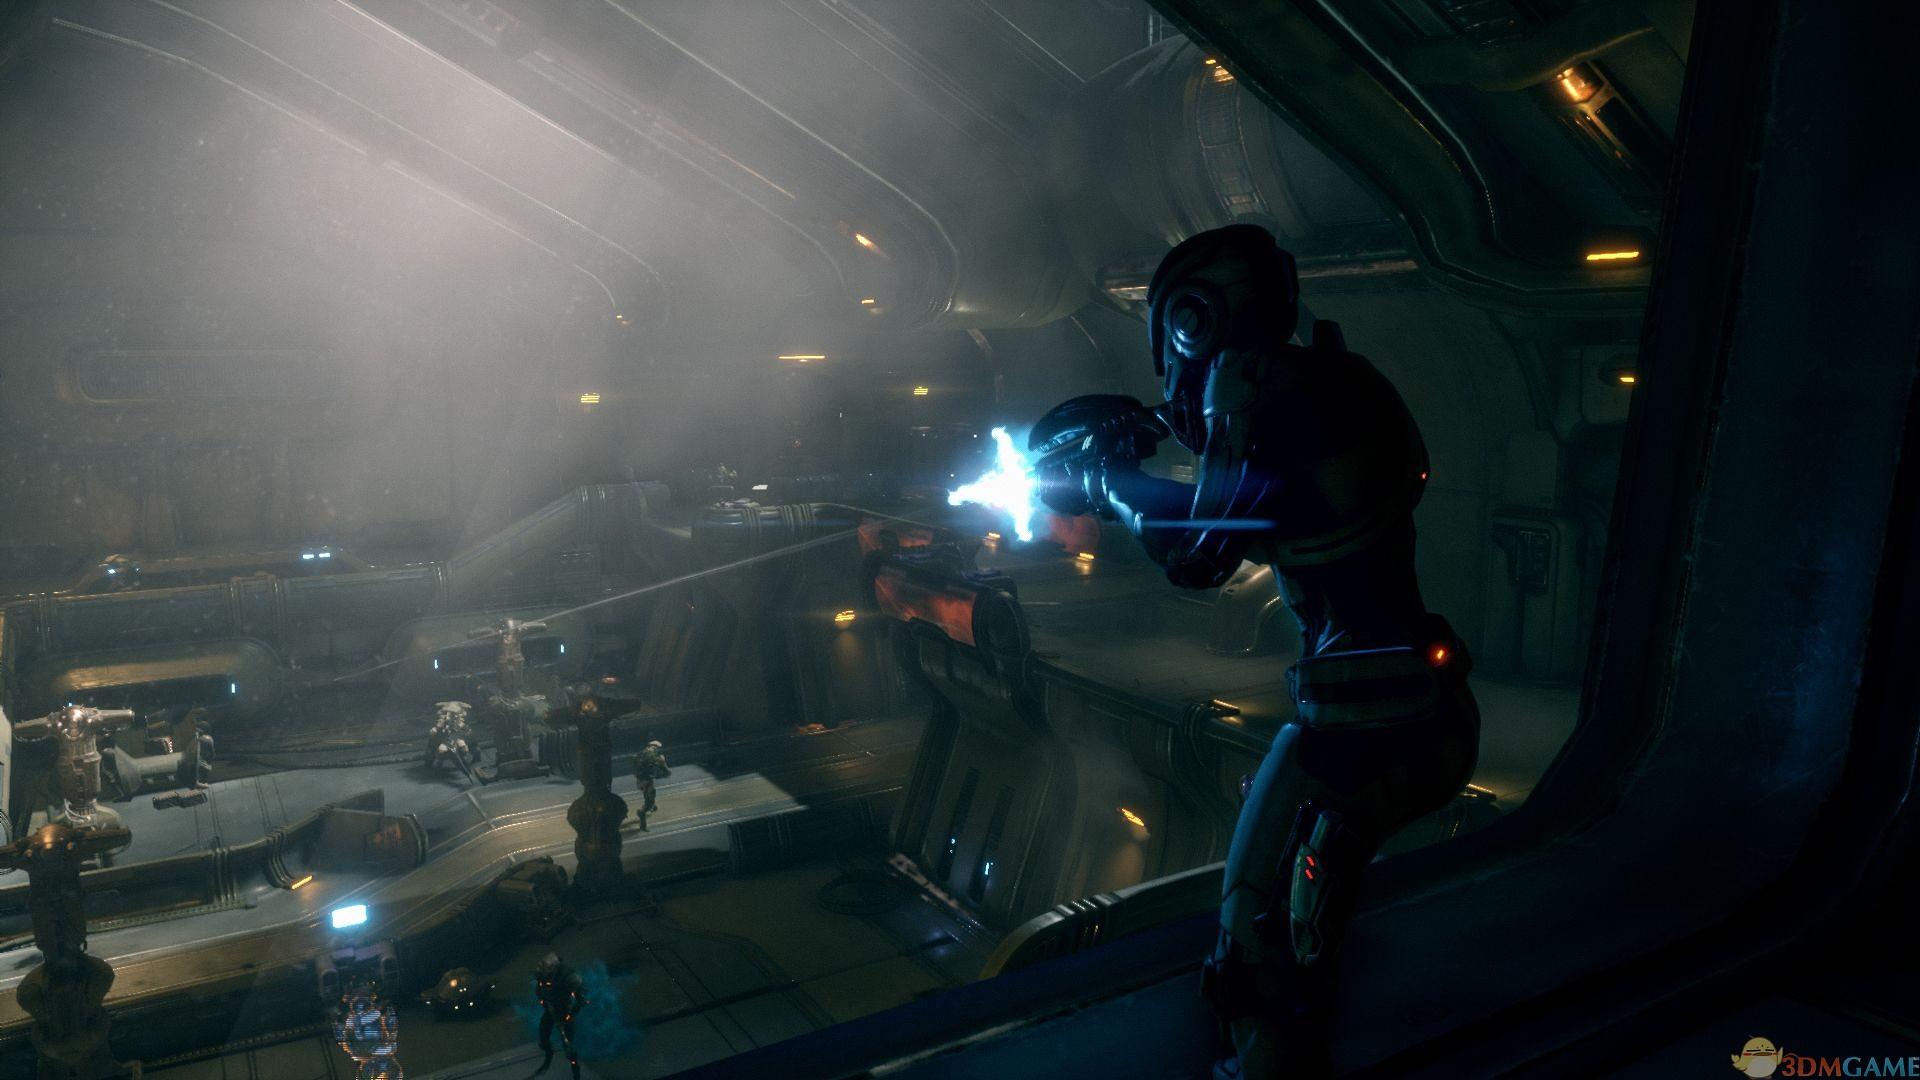 质量效应:仙女座 (Mass Effect:Andromeda)【v1.10豪华版 轩辕简中汉化 补】插图3